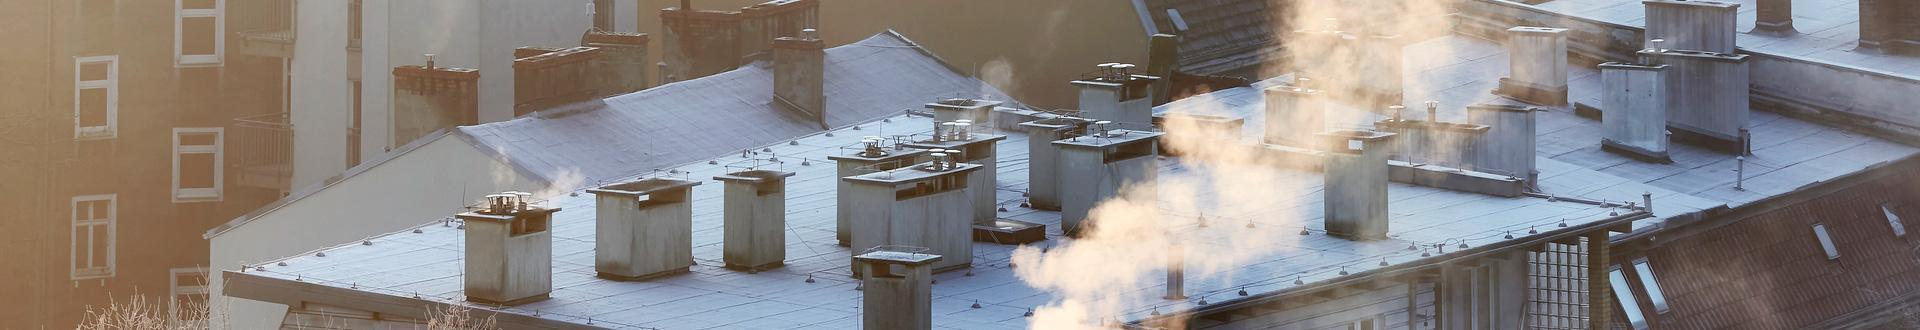 kominy na dachu bloku